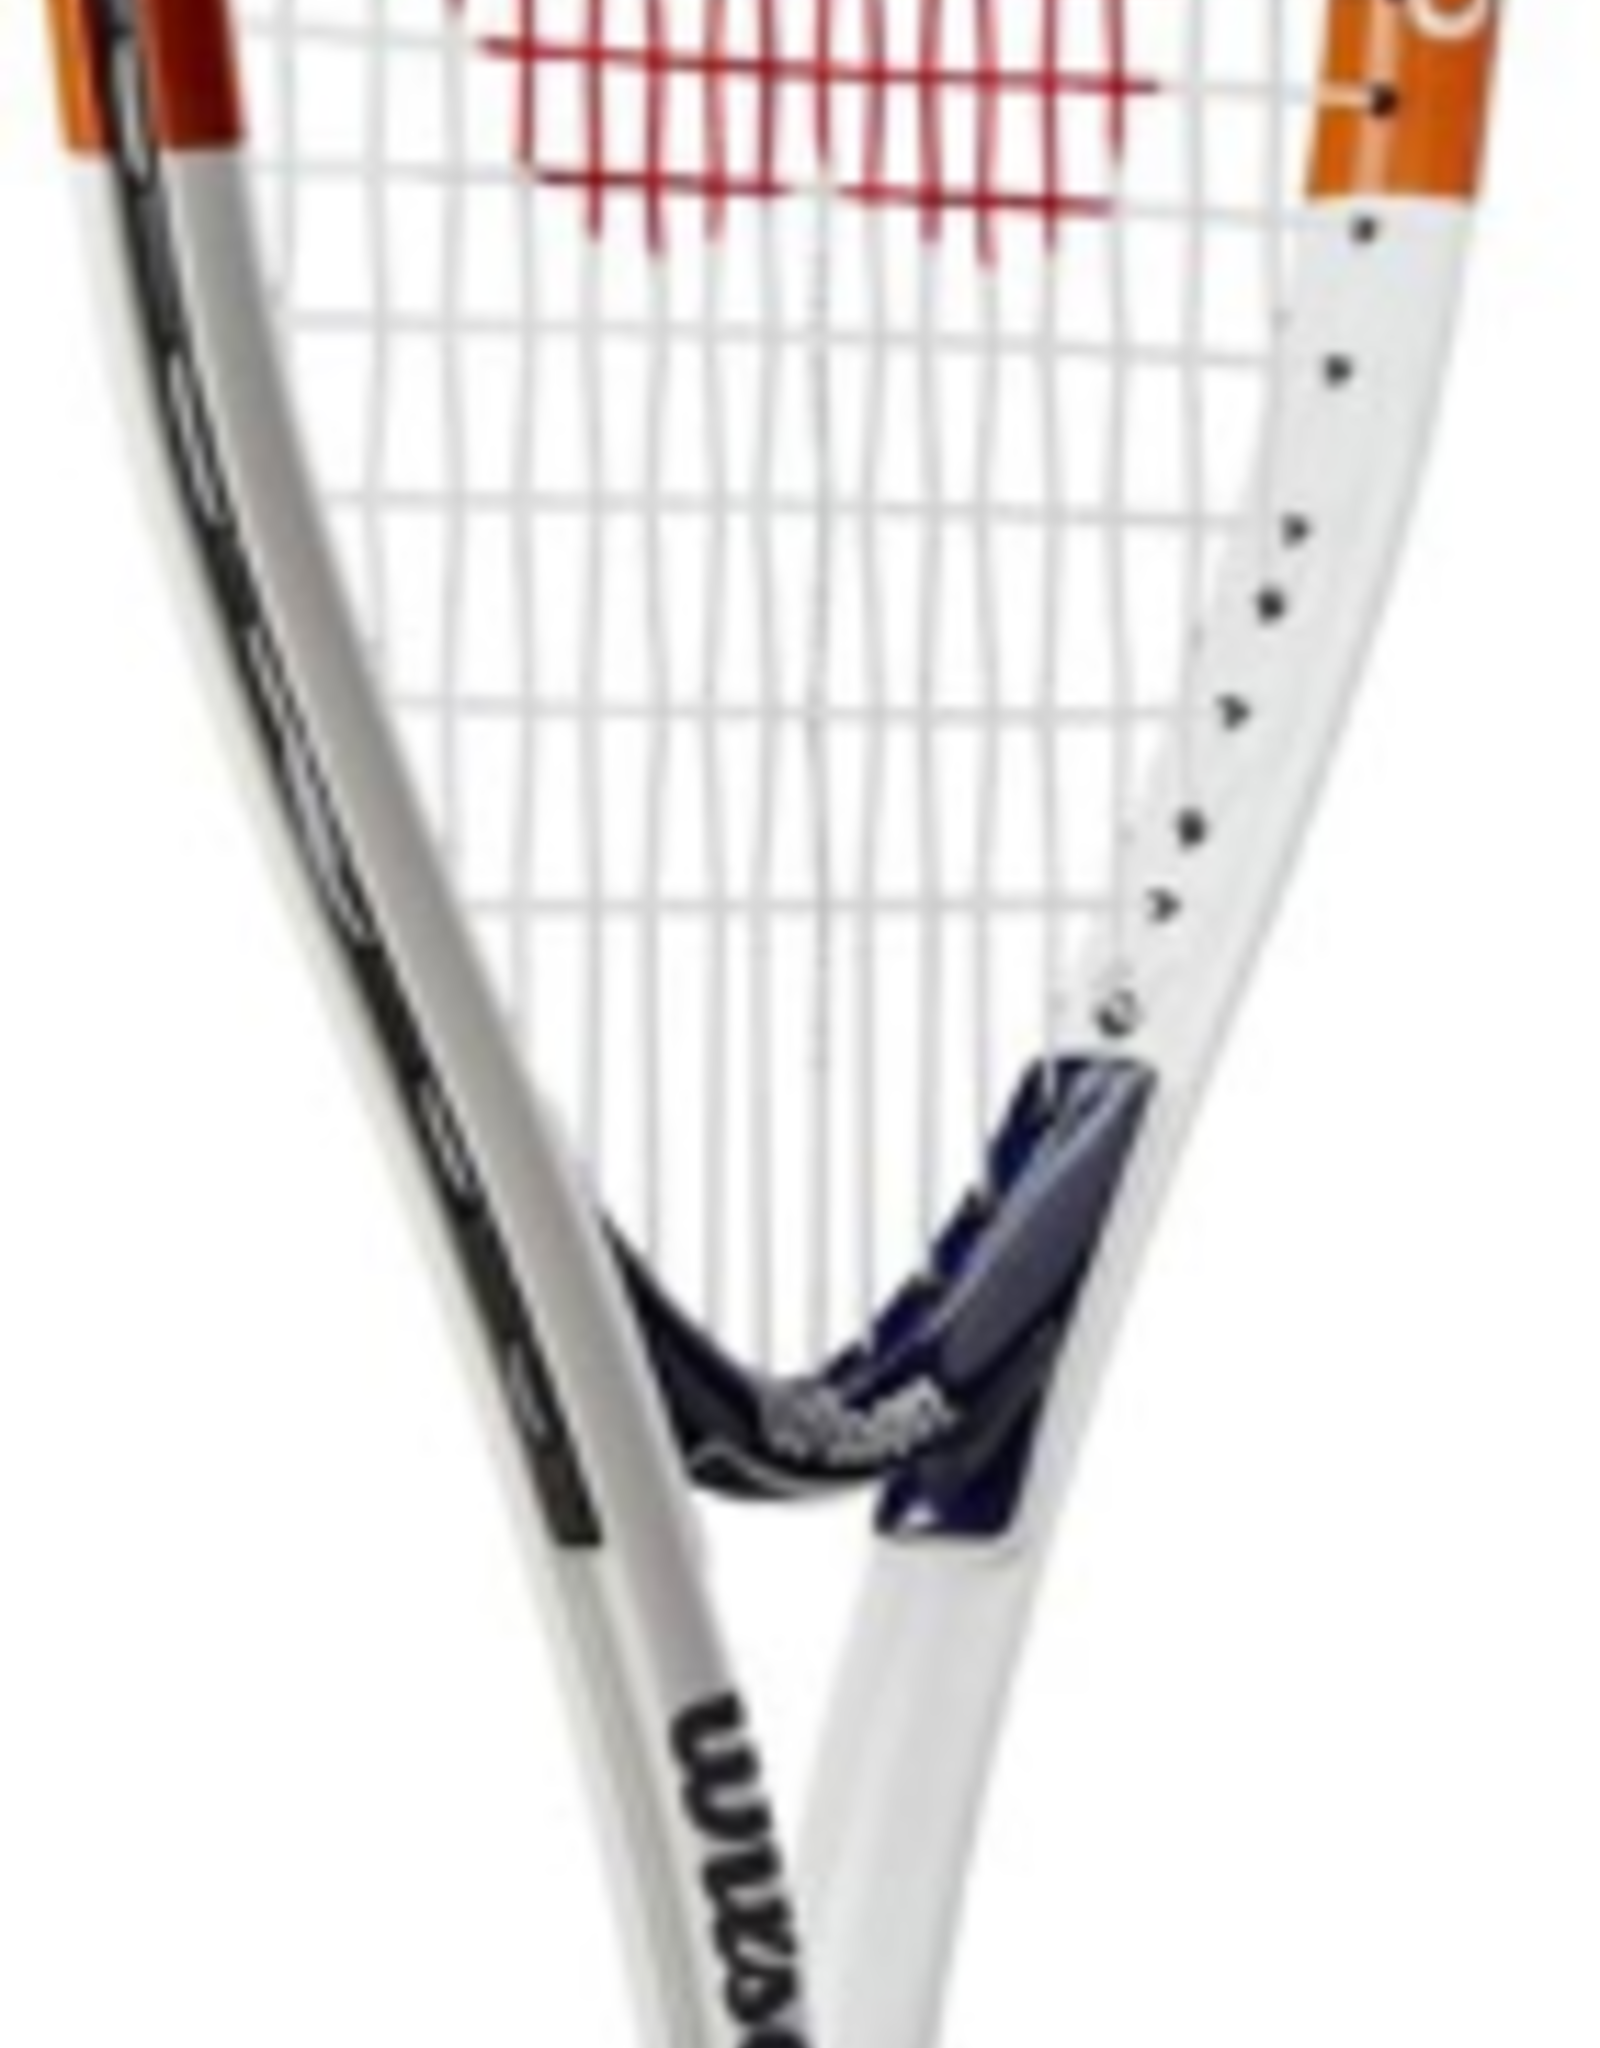 Wilson Raquette Tennis Rolang Garros 5-6 ans